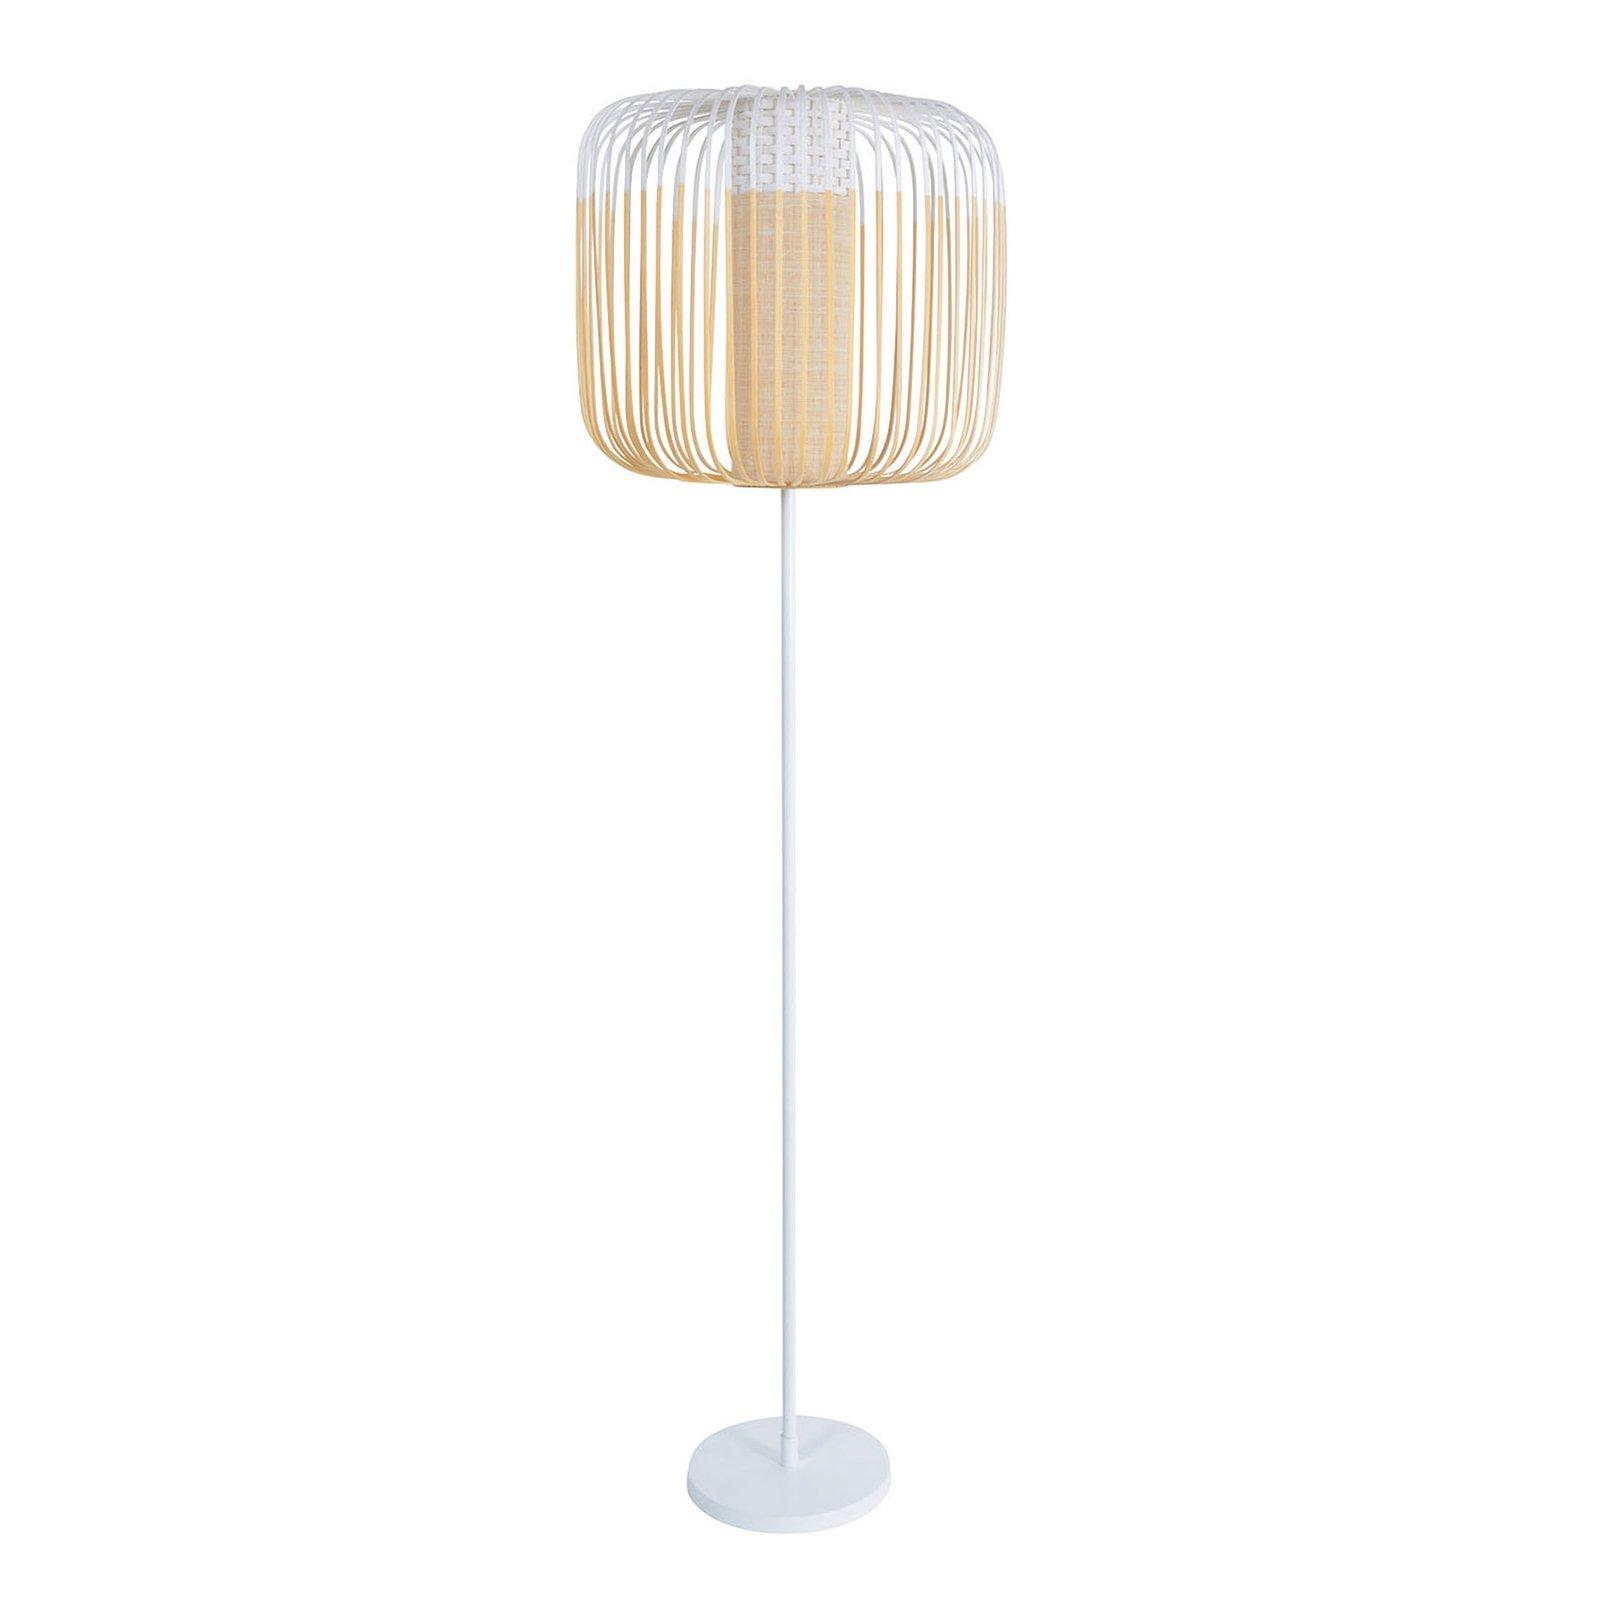 Forestier Bamboo Light gulvlampe, 1 lyskilde, hvit